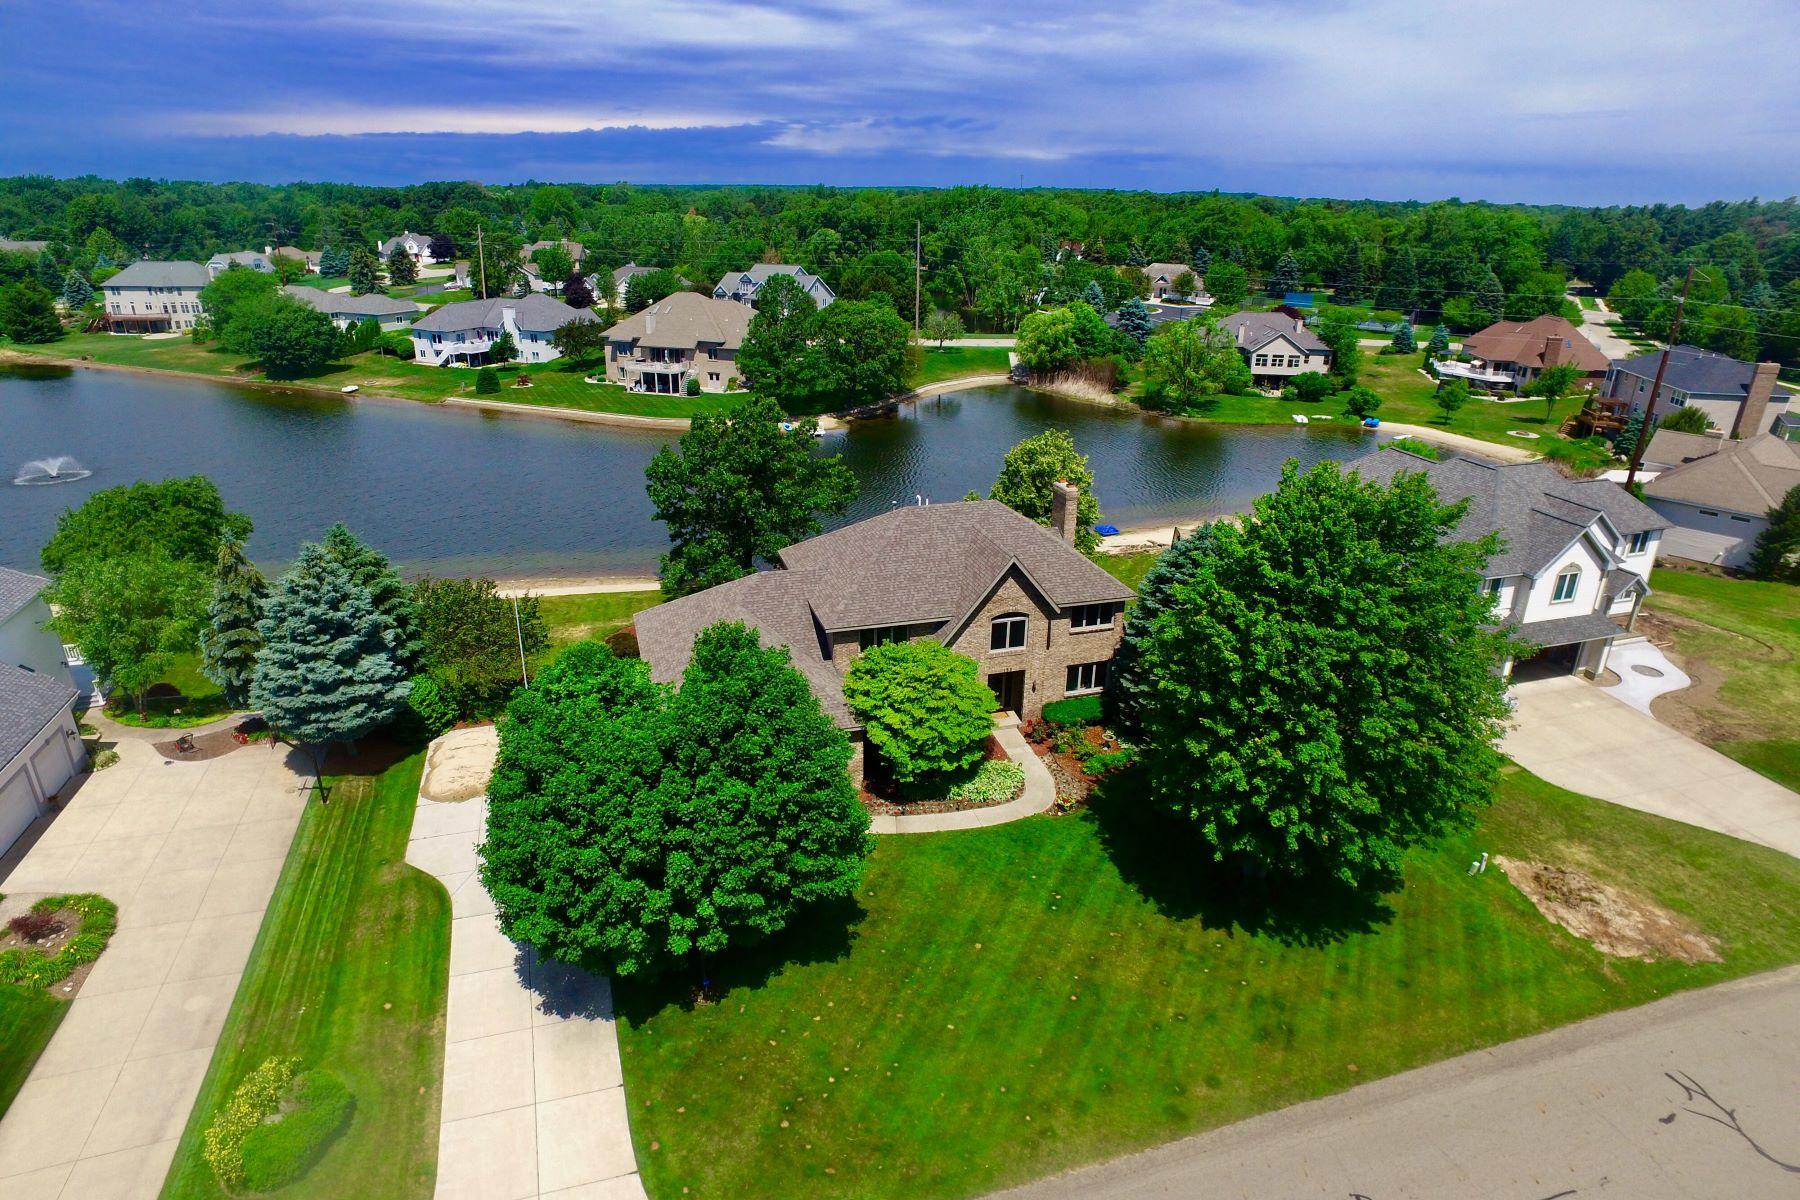 独户住宅 为 销售 在 Privacy, Elegance, and Function 156 Bay Meadows Drive 霍德兰, 密歇根州, 49424 美国